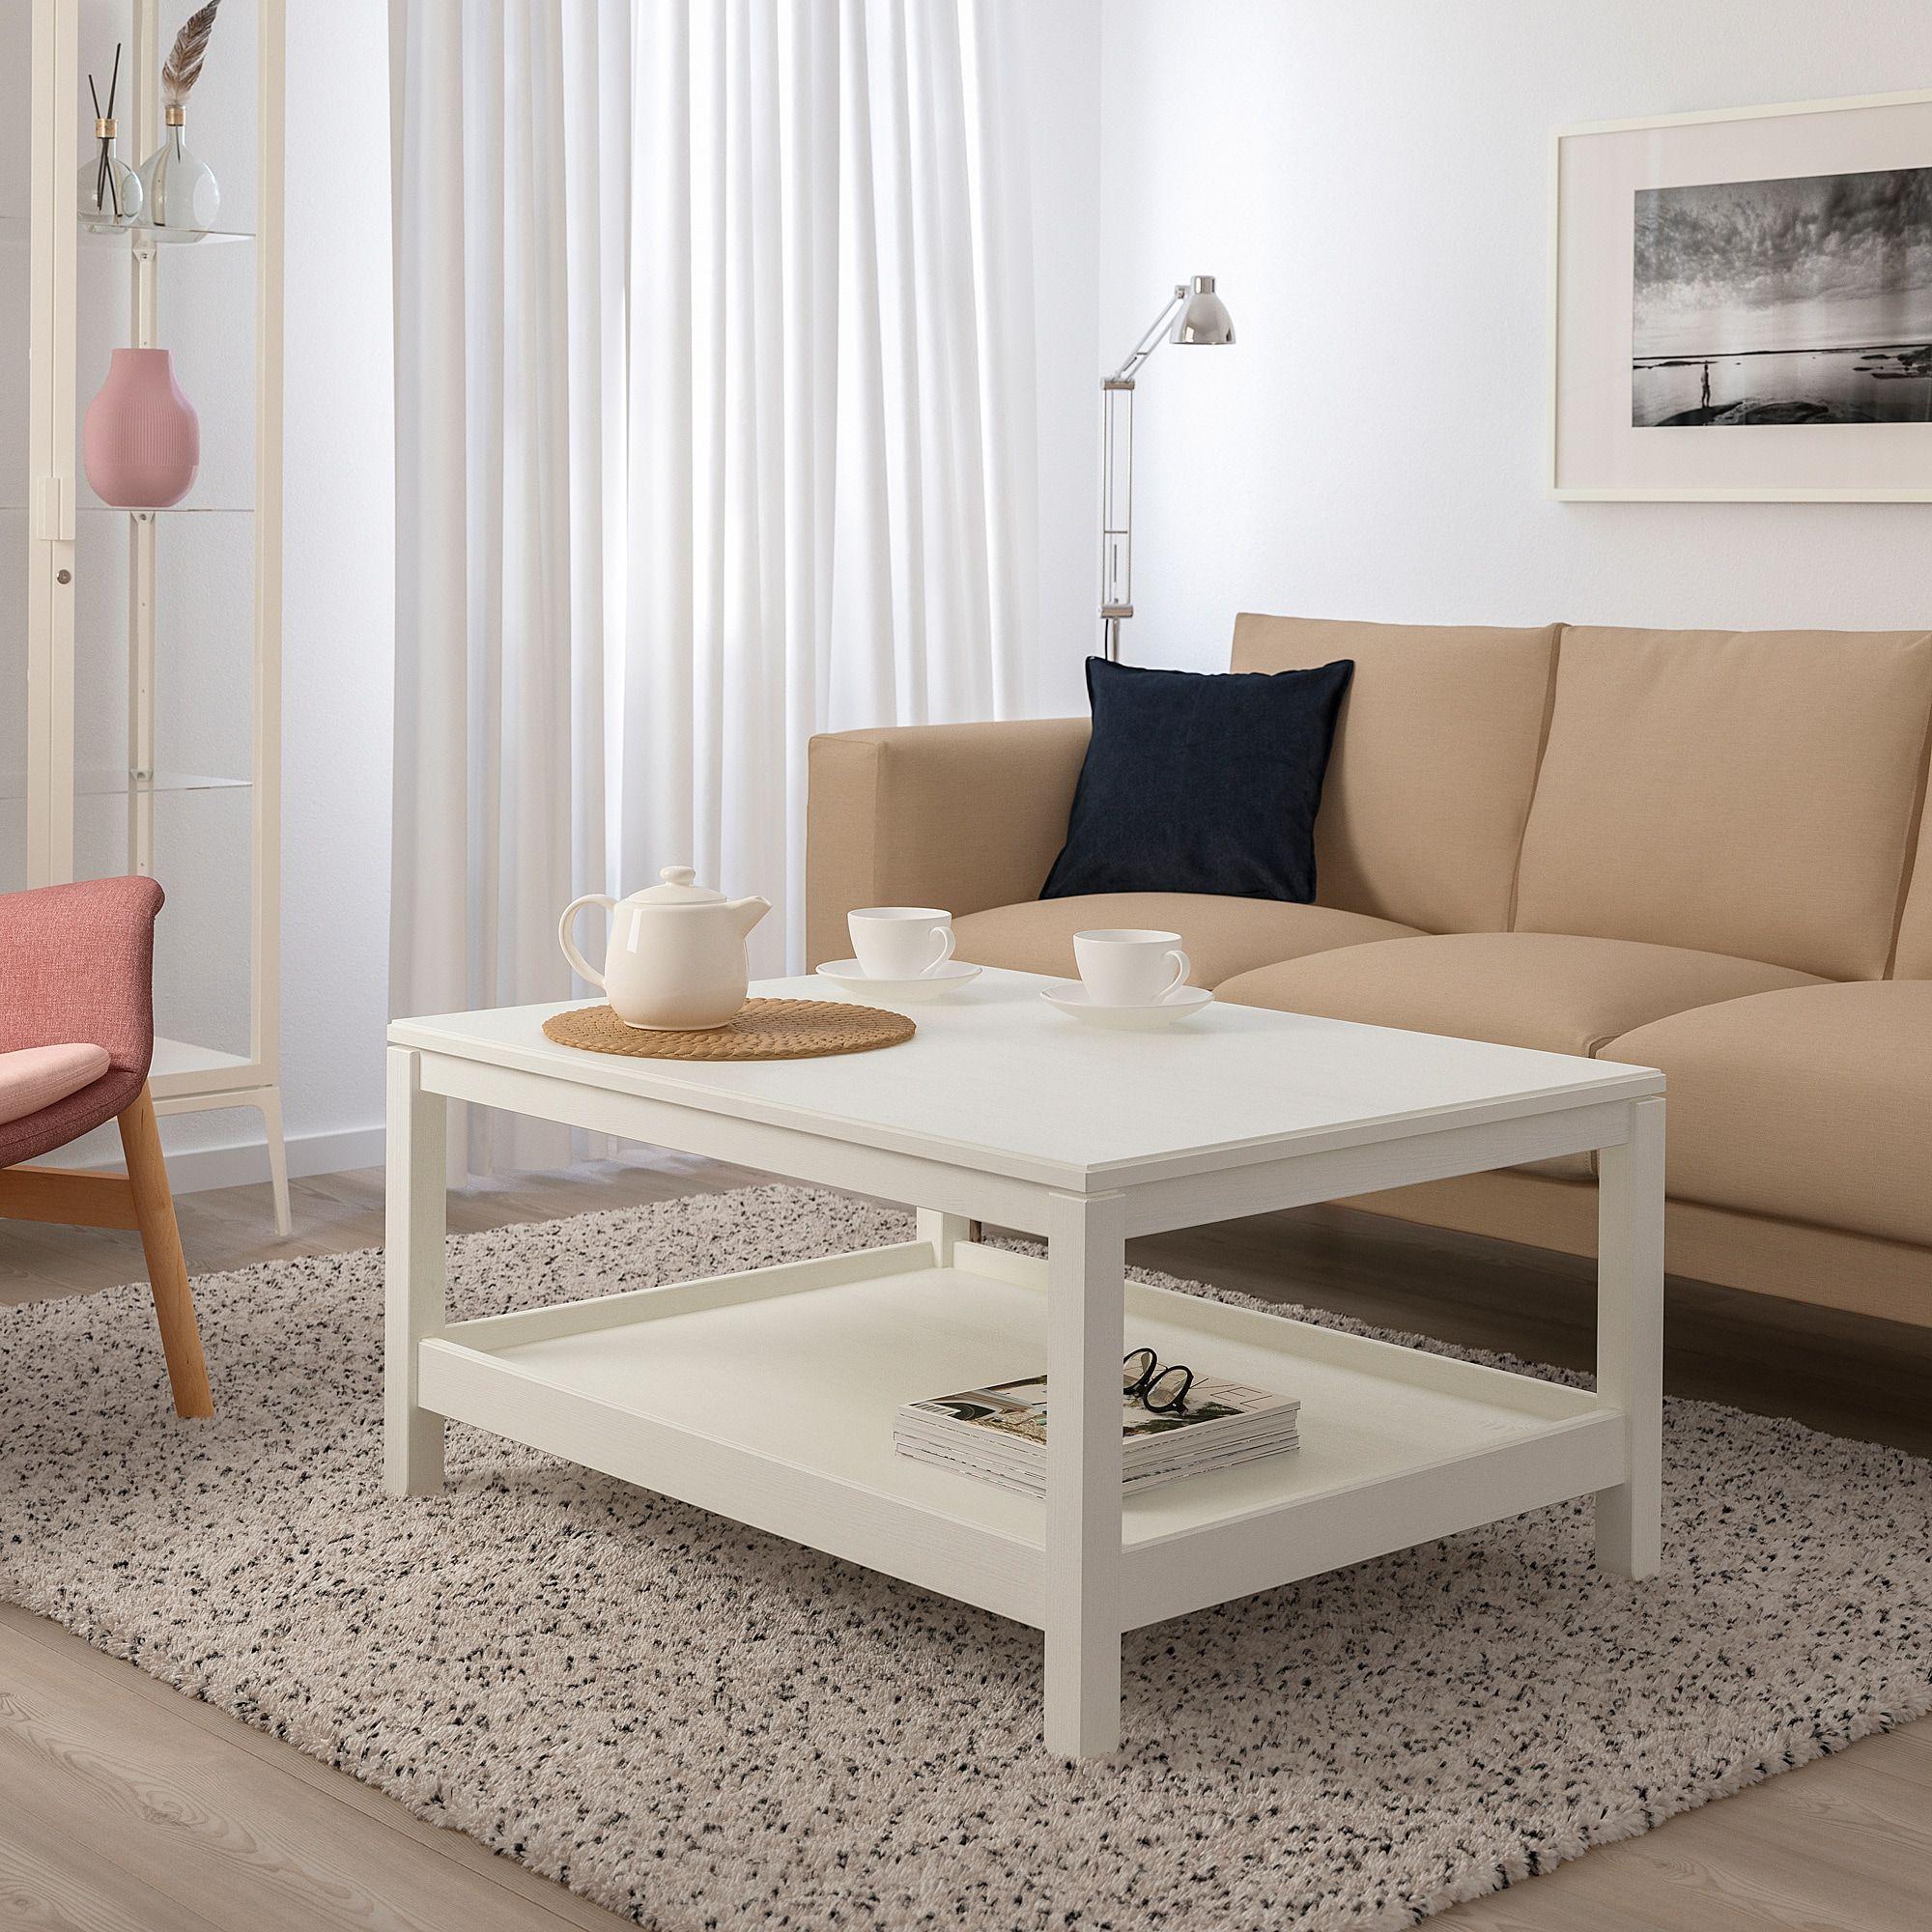 Havsta White Coffee Table 100x75 Cm Ikea Idei Ikea Belye Kozhanye Divany Skandinavskij Dizajn [ 2000 x 2000 Pixel ]